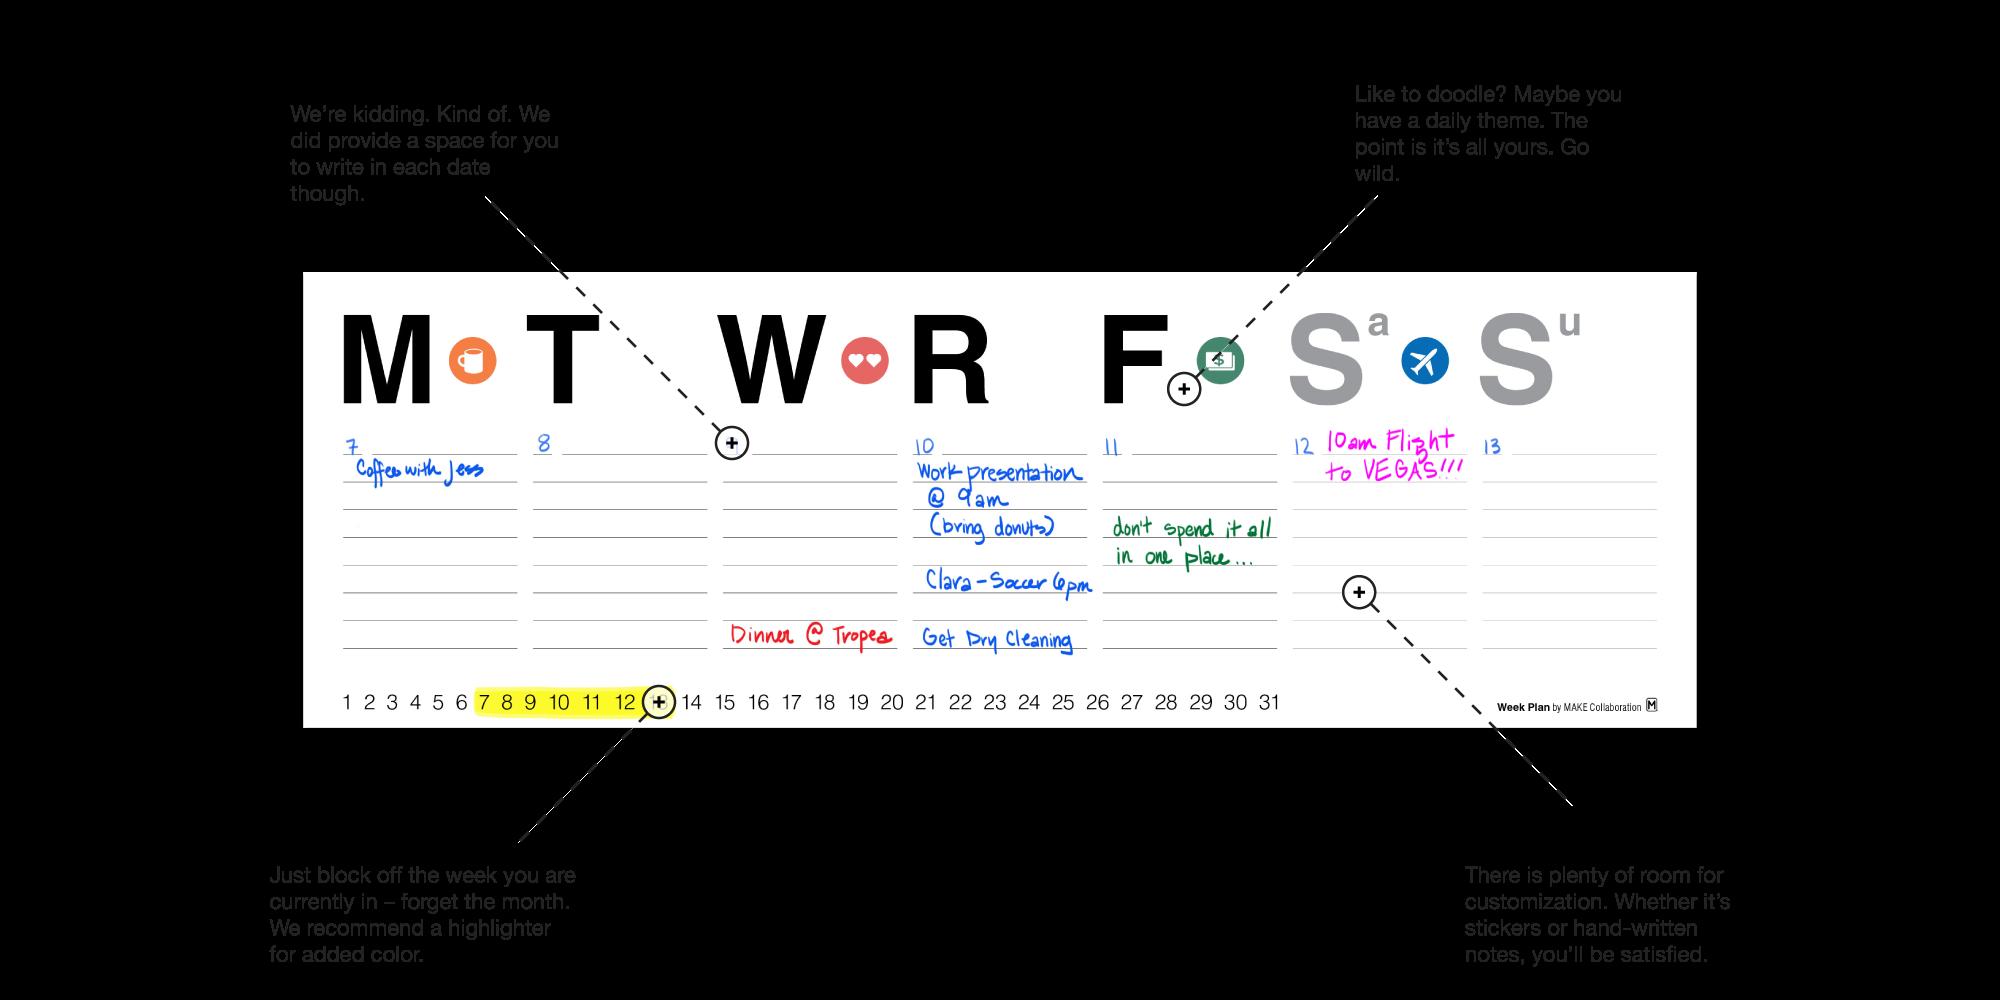 week-plan-features.png